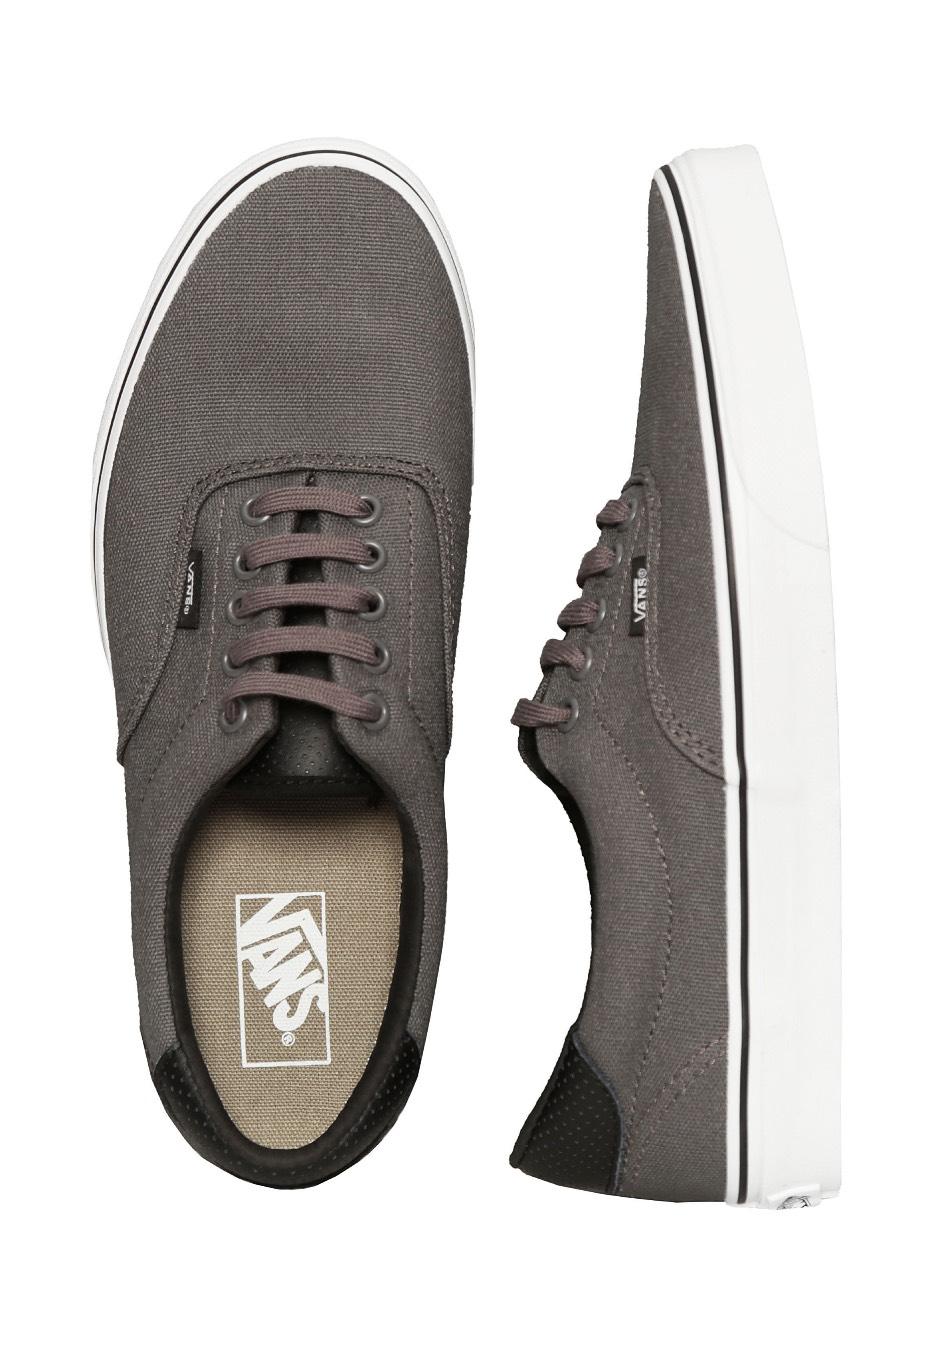 amp;p Es 59 Zapatos Era C Pewterblack Vans xTt7AWx